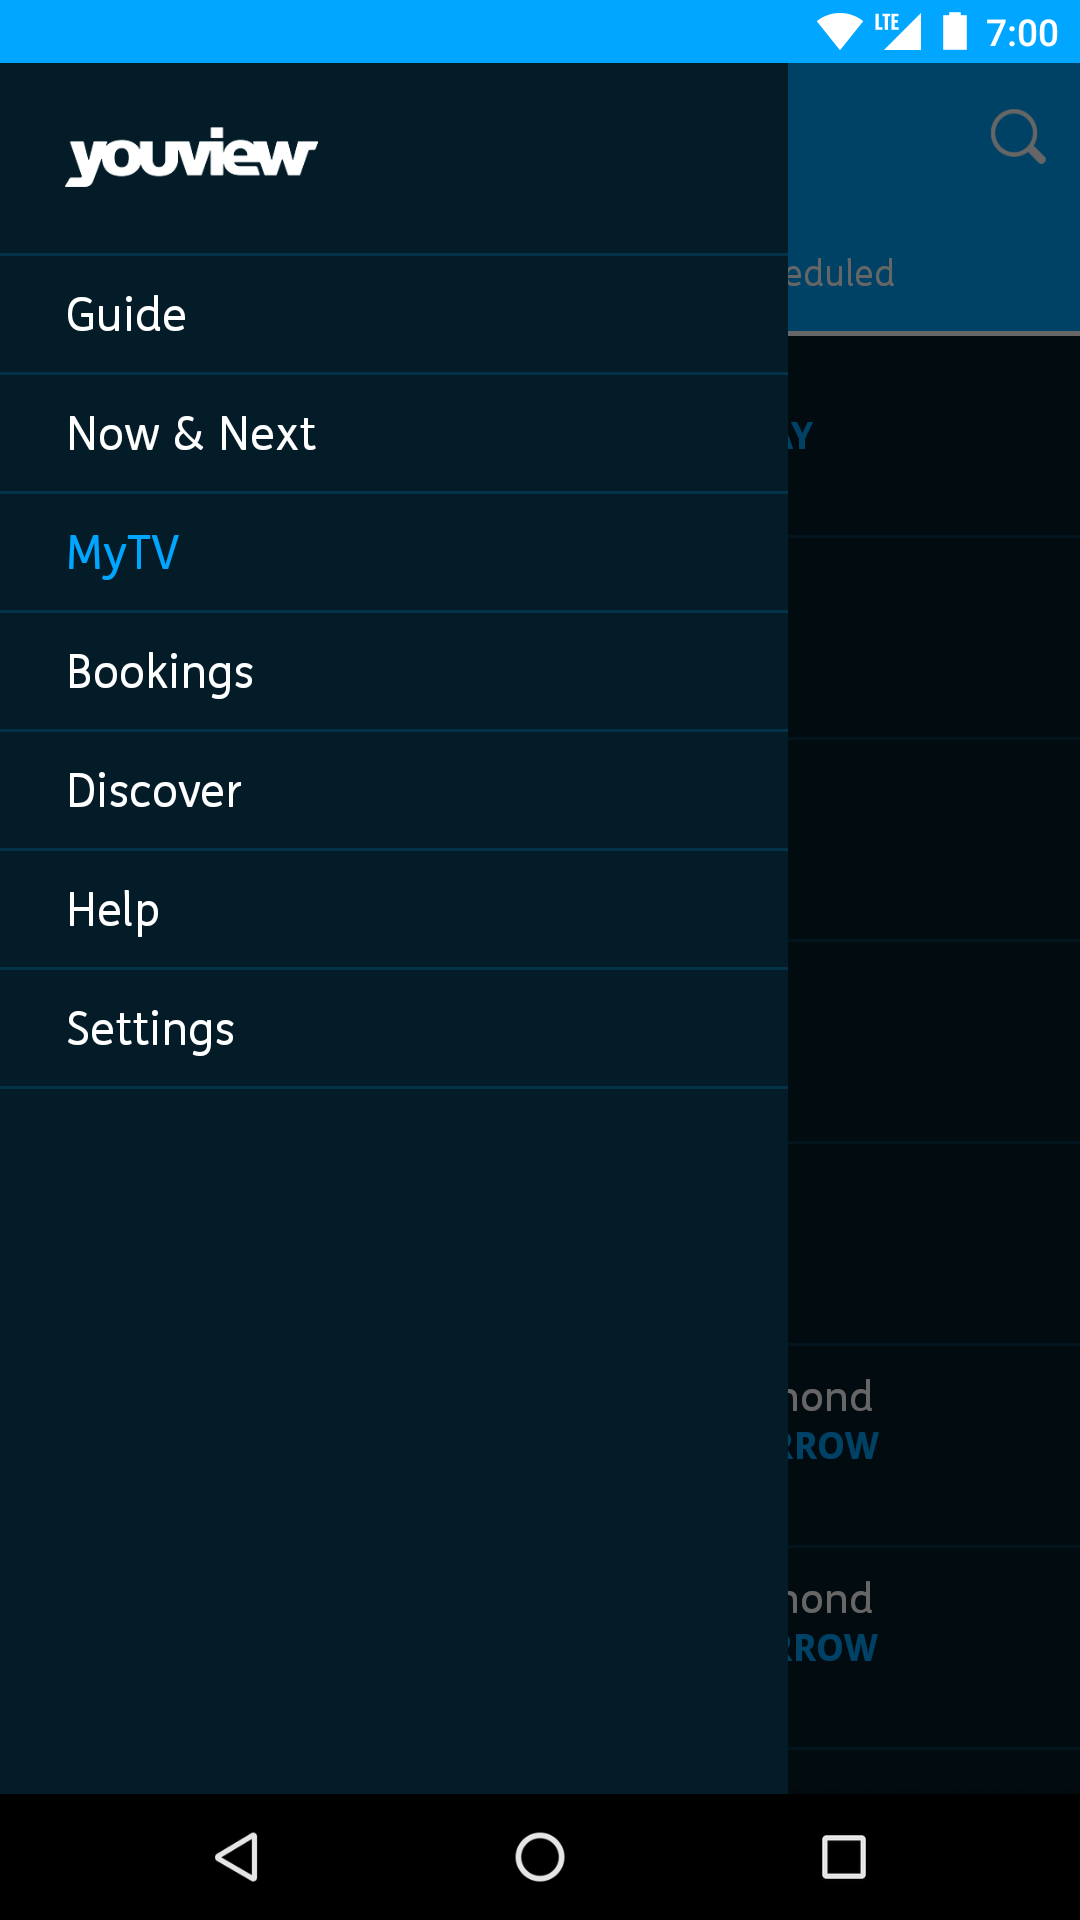 iPad image showing reminders